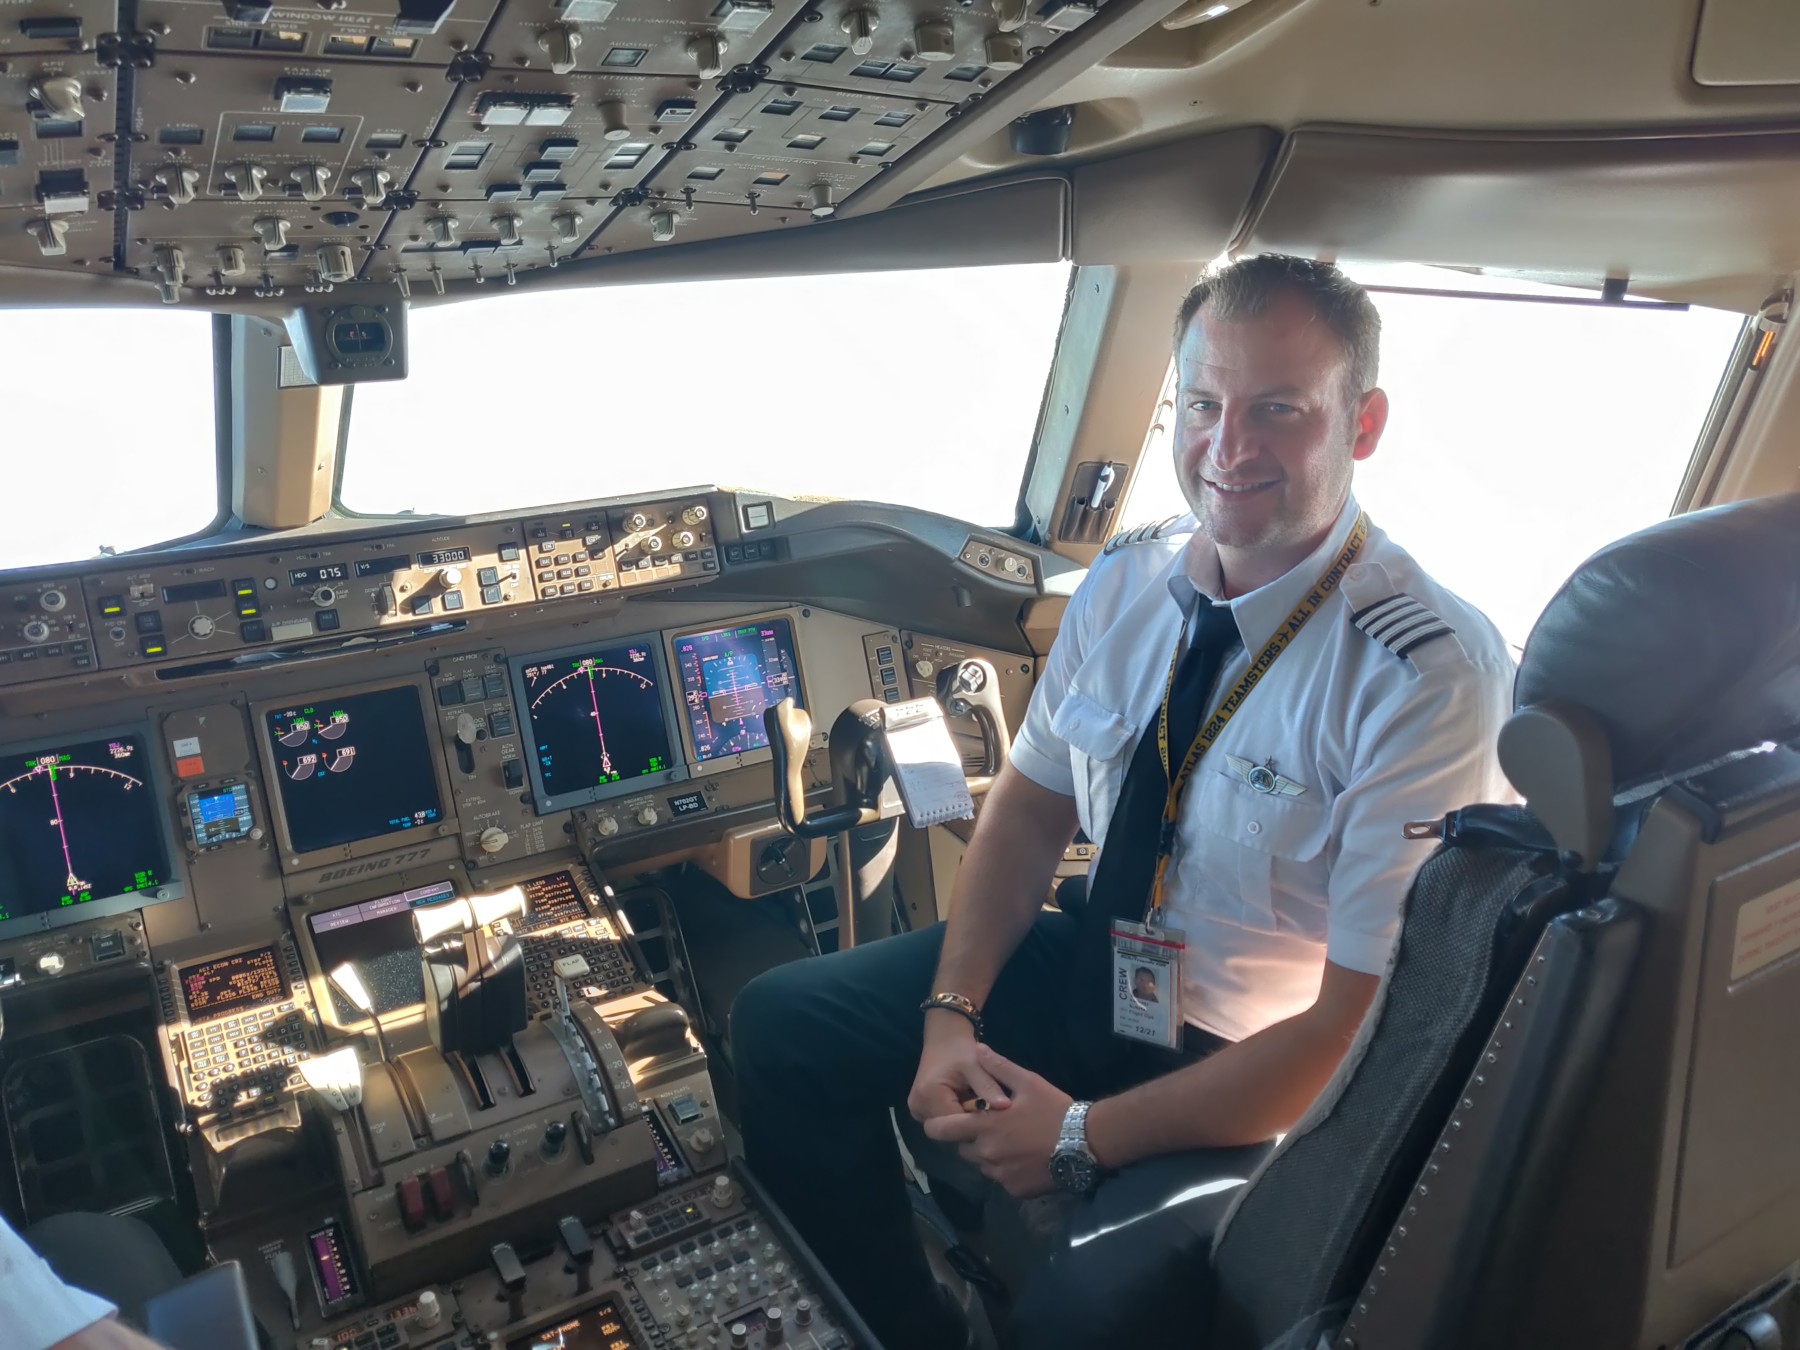 Aνδρέας Κούστας, Κυβερνήτης Boeing (B-777)